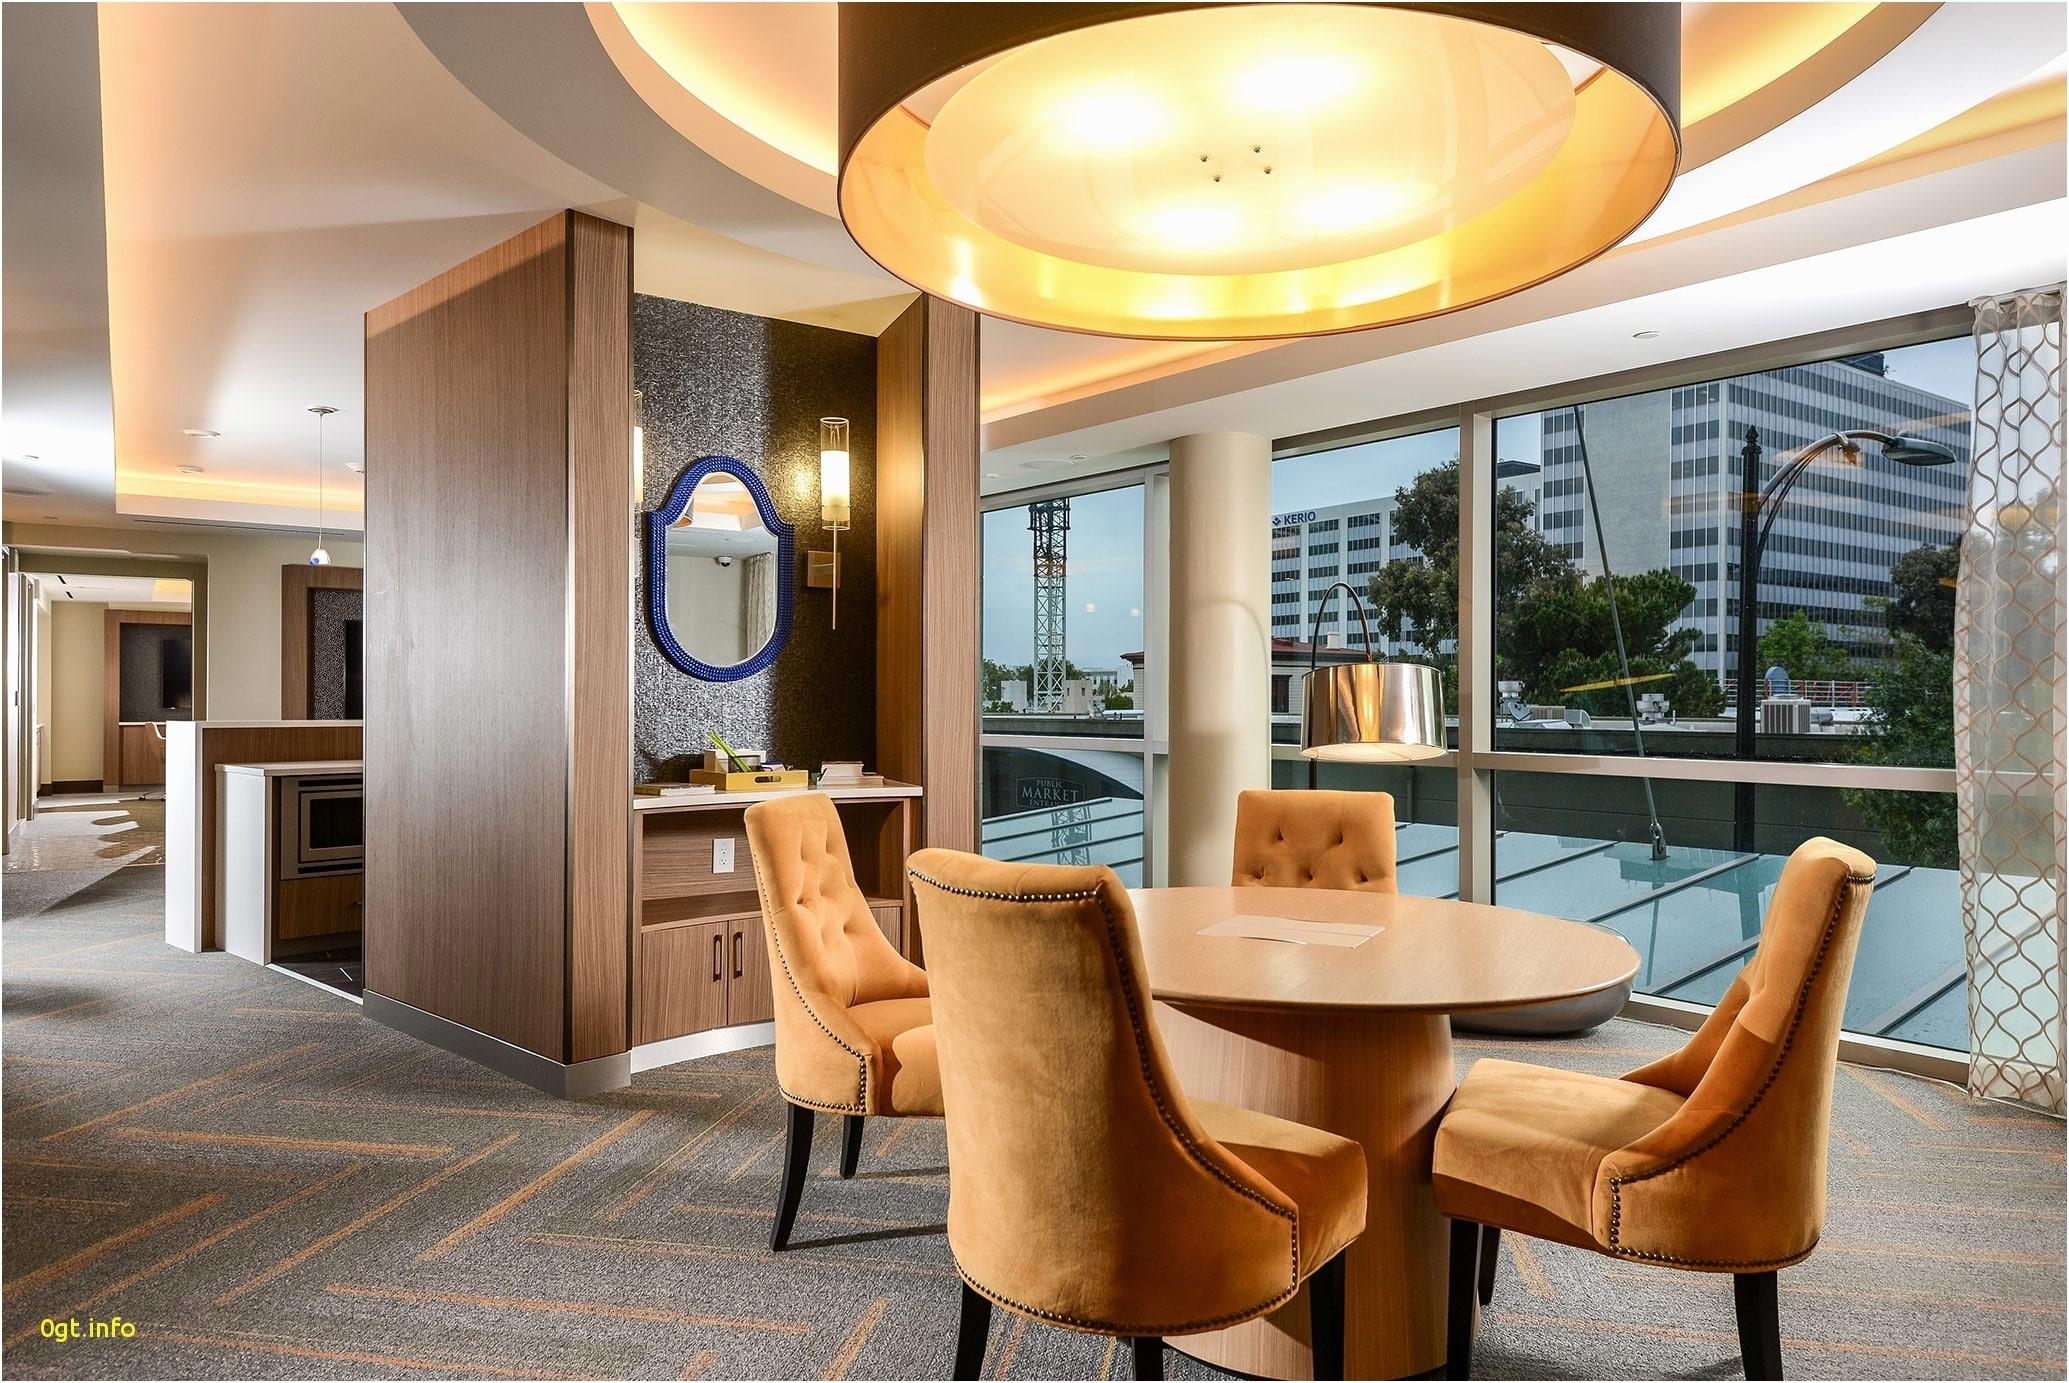 3 bedroom apartments for rent in elizabeth nj craigslist 3 bedroom apartments nj elegant 3 bedroom - 3 Bedroom For Rent